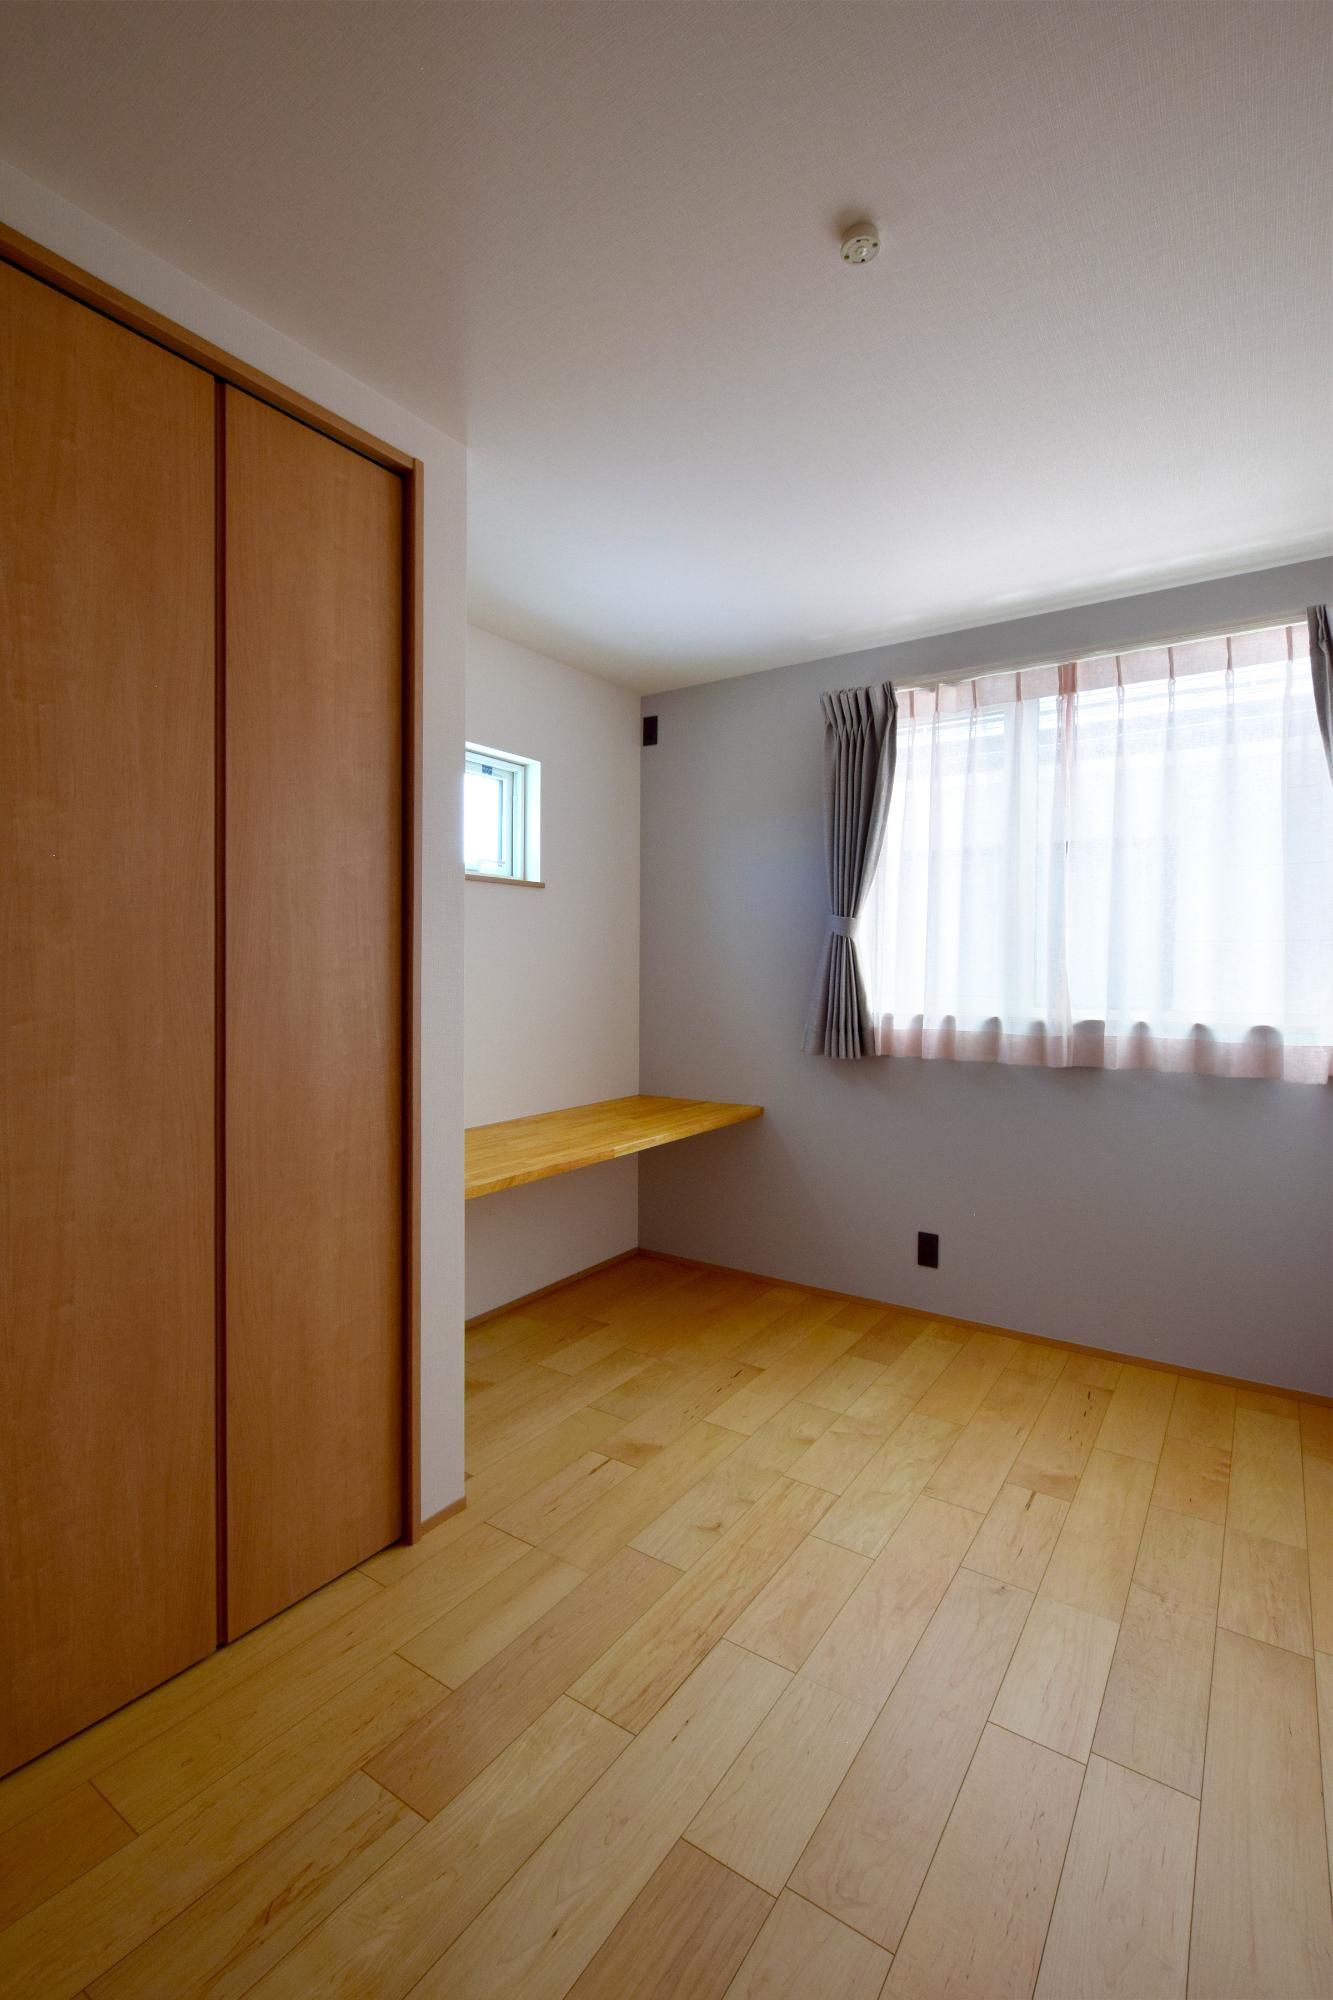 DETAIL HOME(ディテールホーム)「ハコ型という選択×耐震3の家」のシンプル・ナチュラルな居室の実例写真